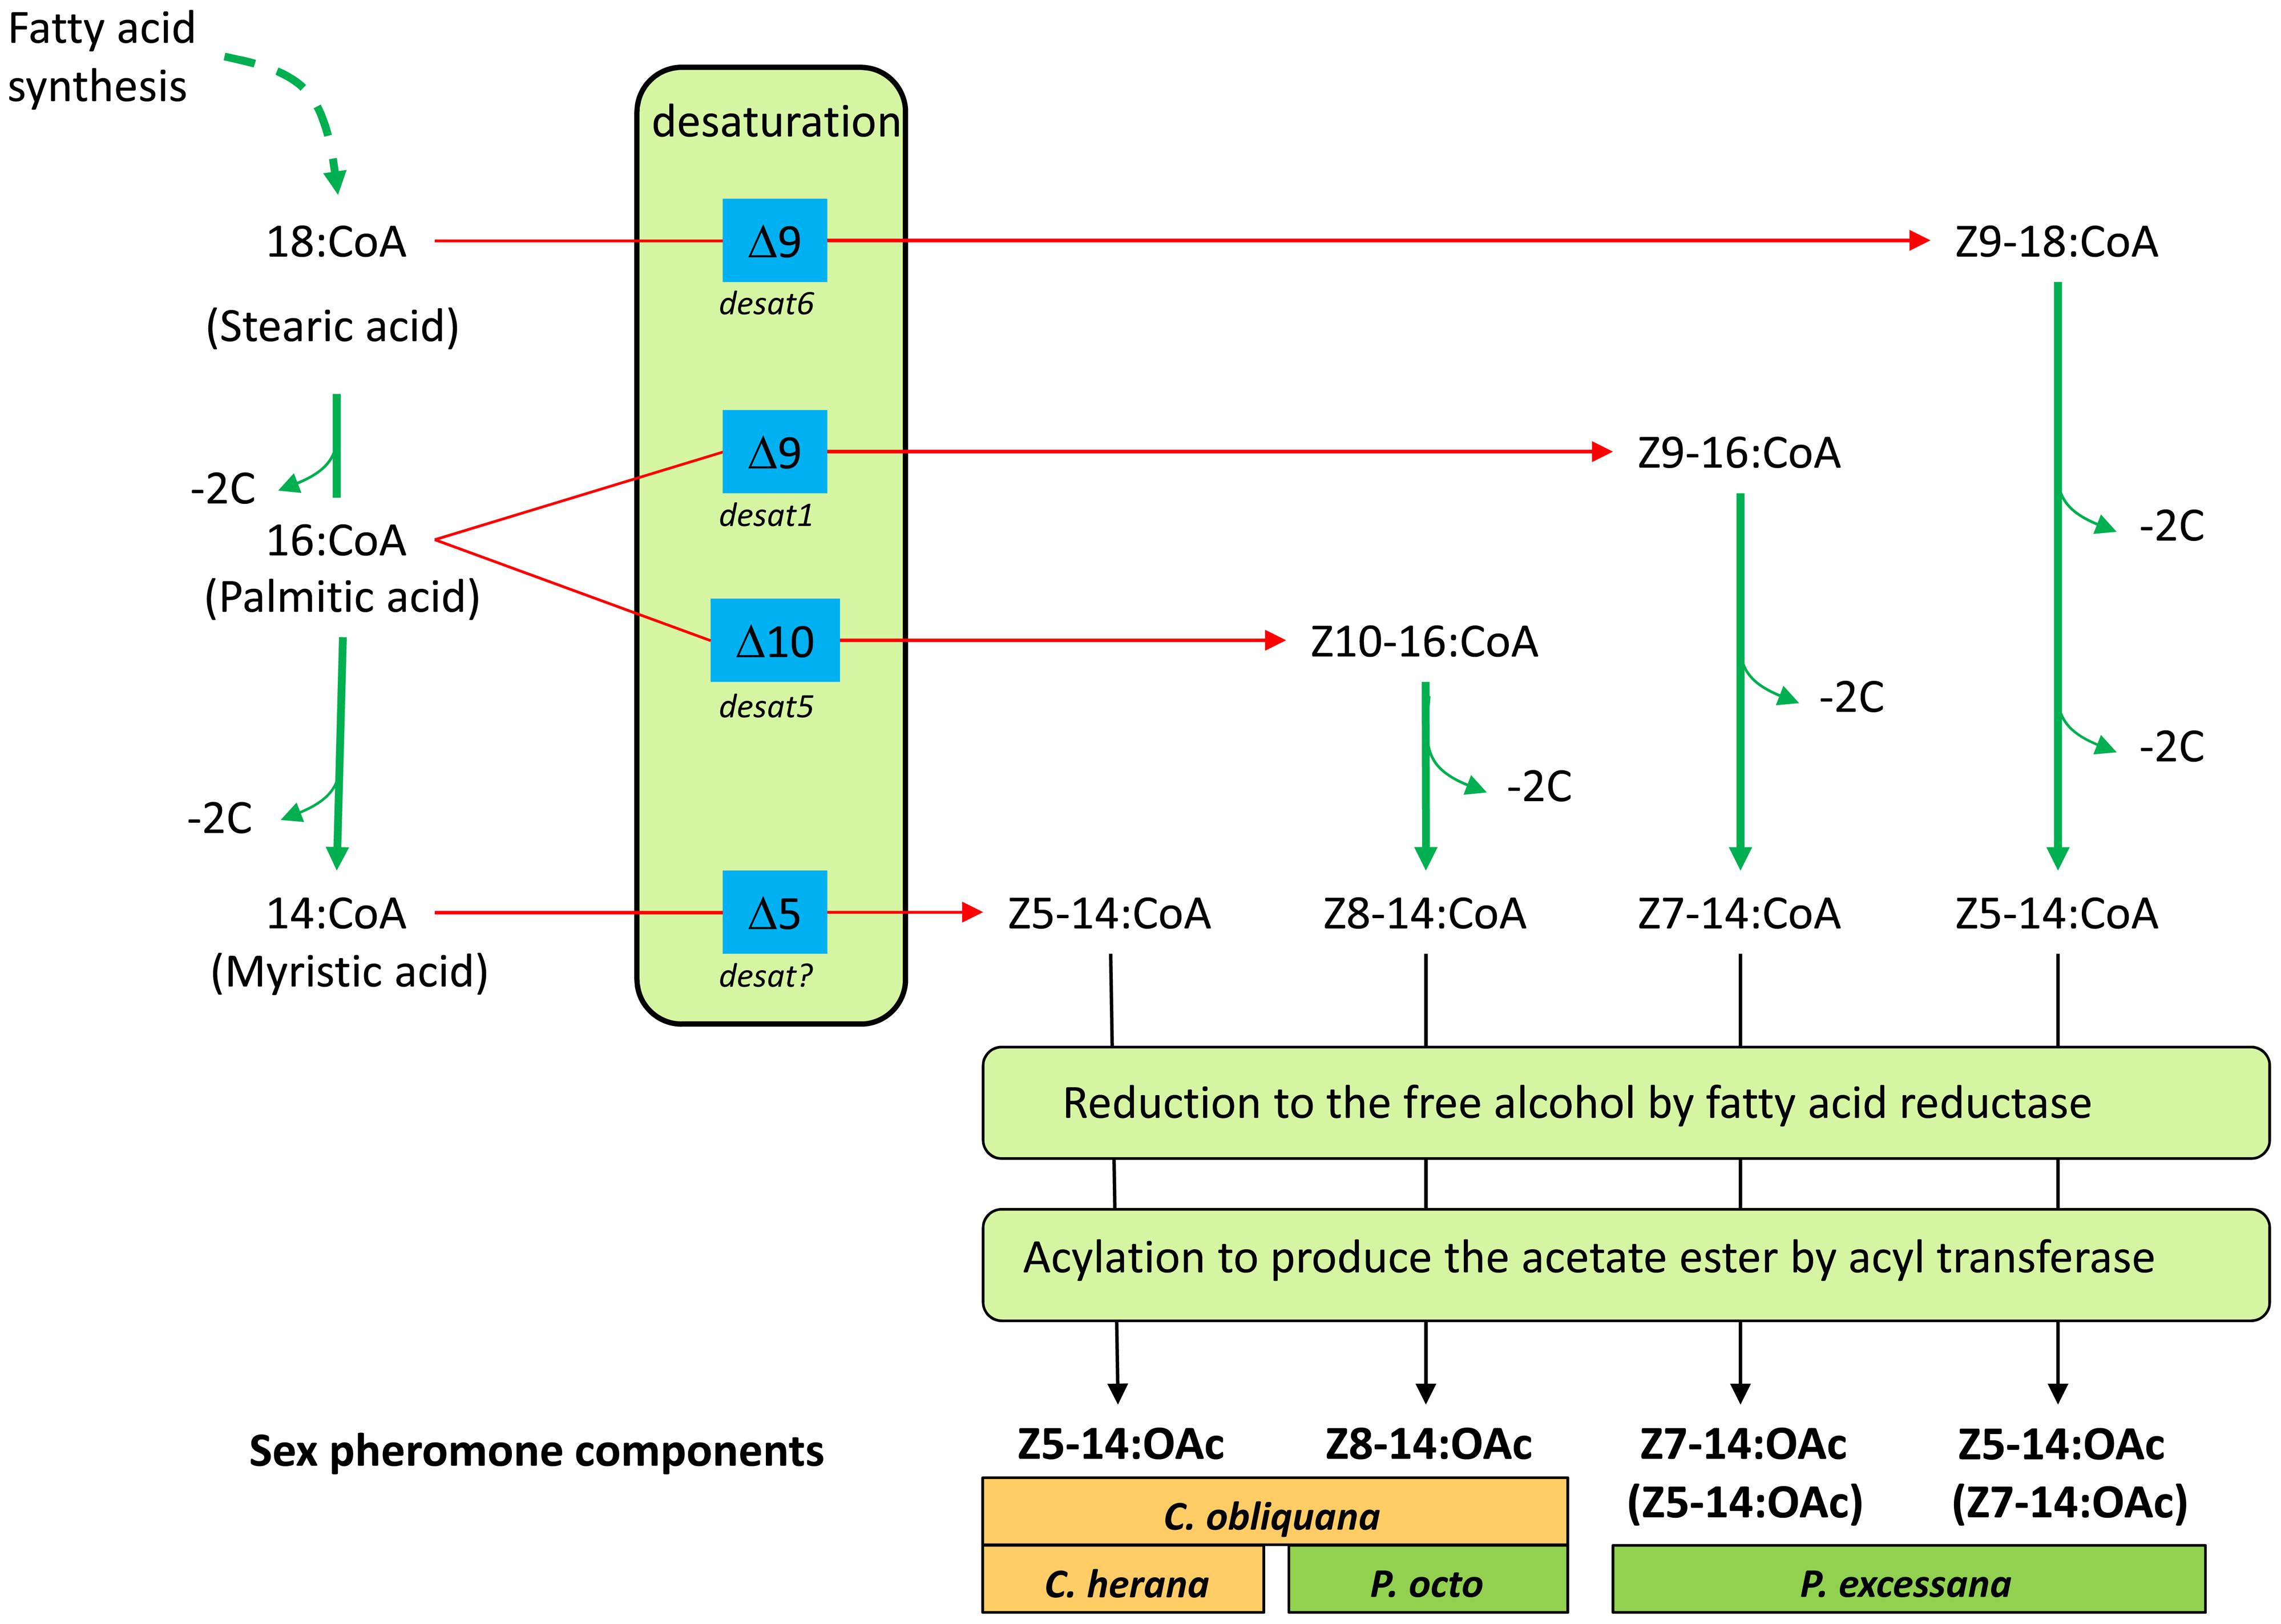 Schematic outlining the likely biosynthetic routes of the sex pheromone components of <i>C. obliquana</i>, <i>C. herana</i>, <i>P. octo</i>, and <i>P. excessana</i>.